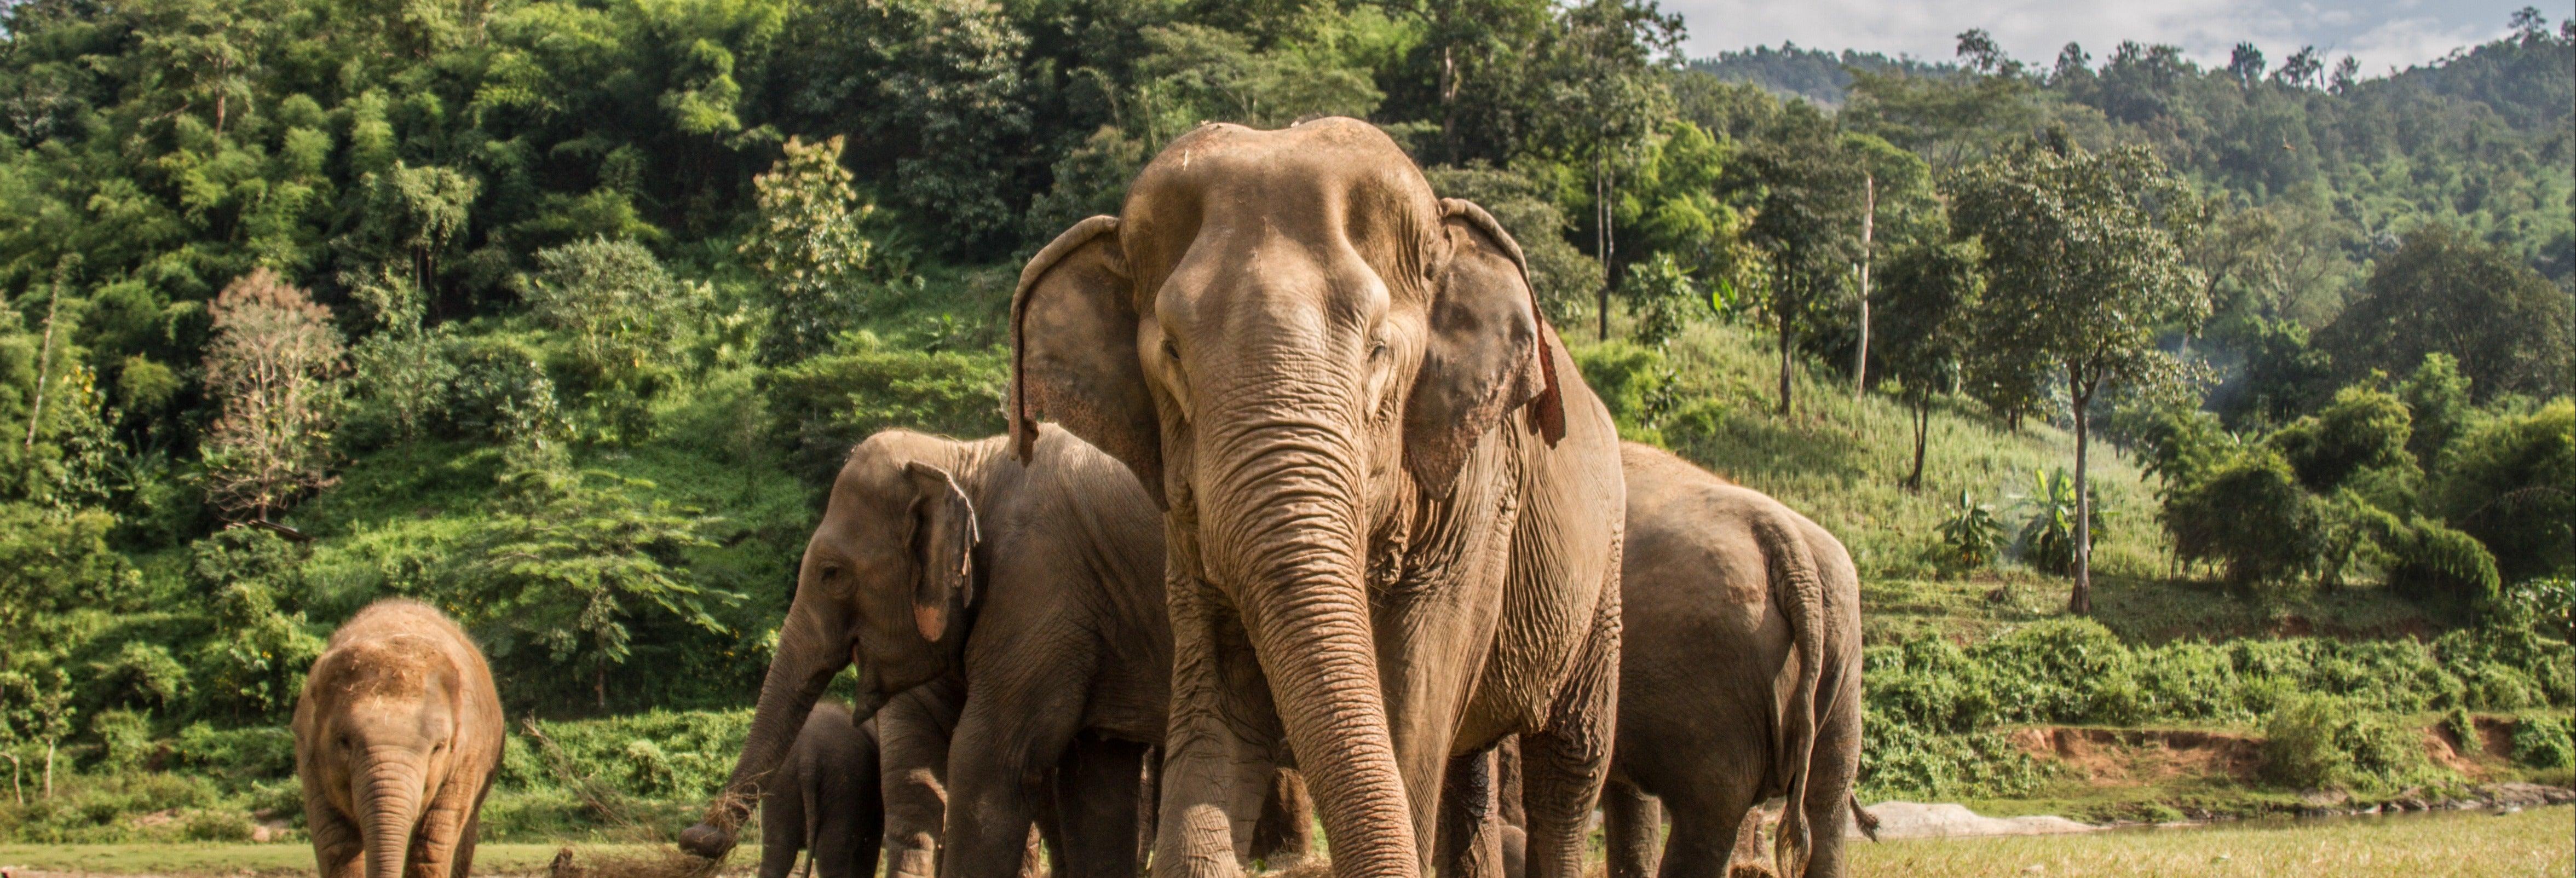 Visita al santuario de elefantes